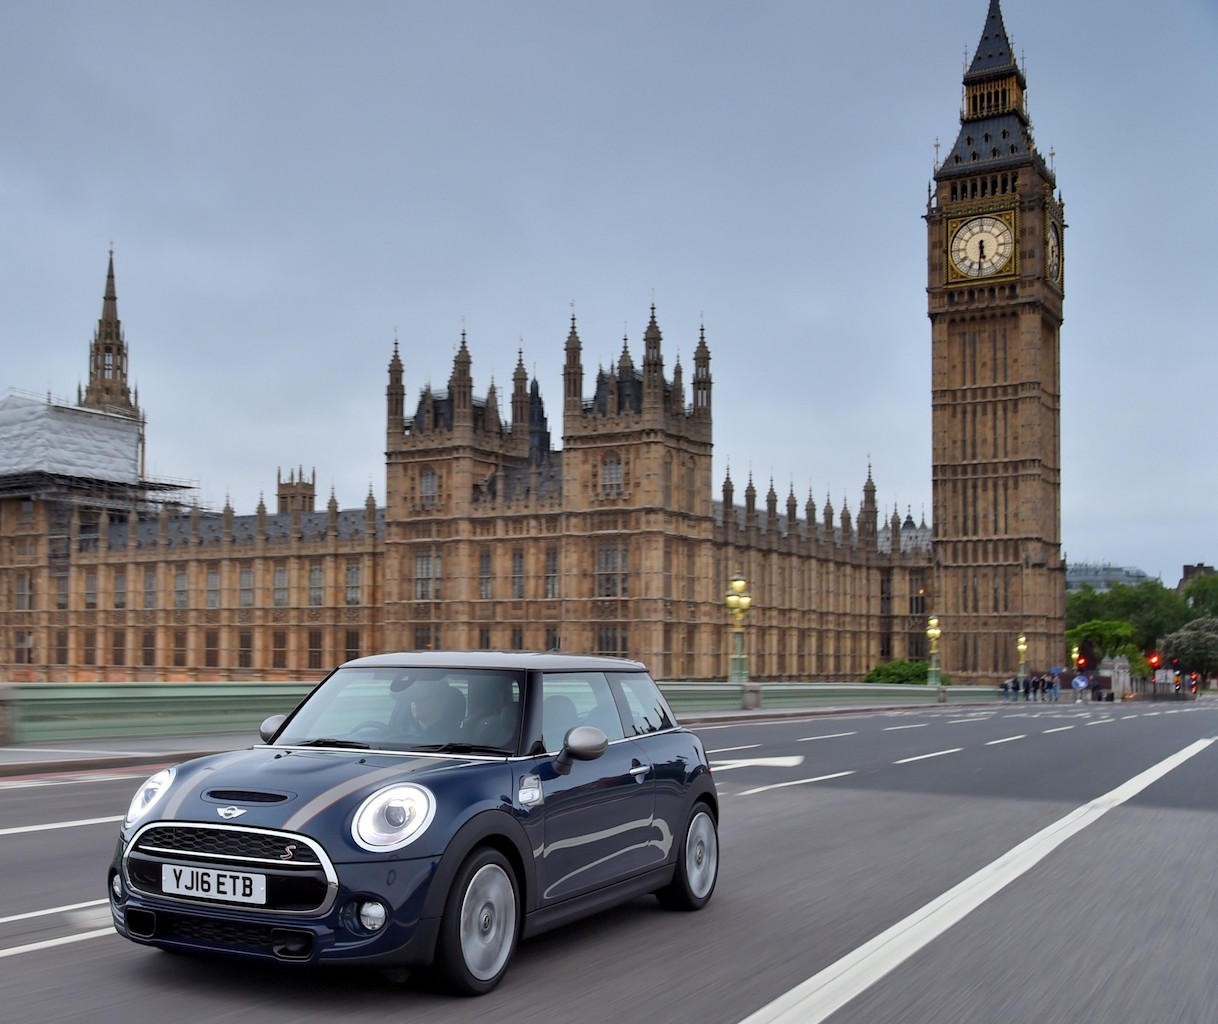 mini-cooper-s-seven-3-door-hatch-a-british-iconic-model-london-view-copy